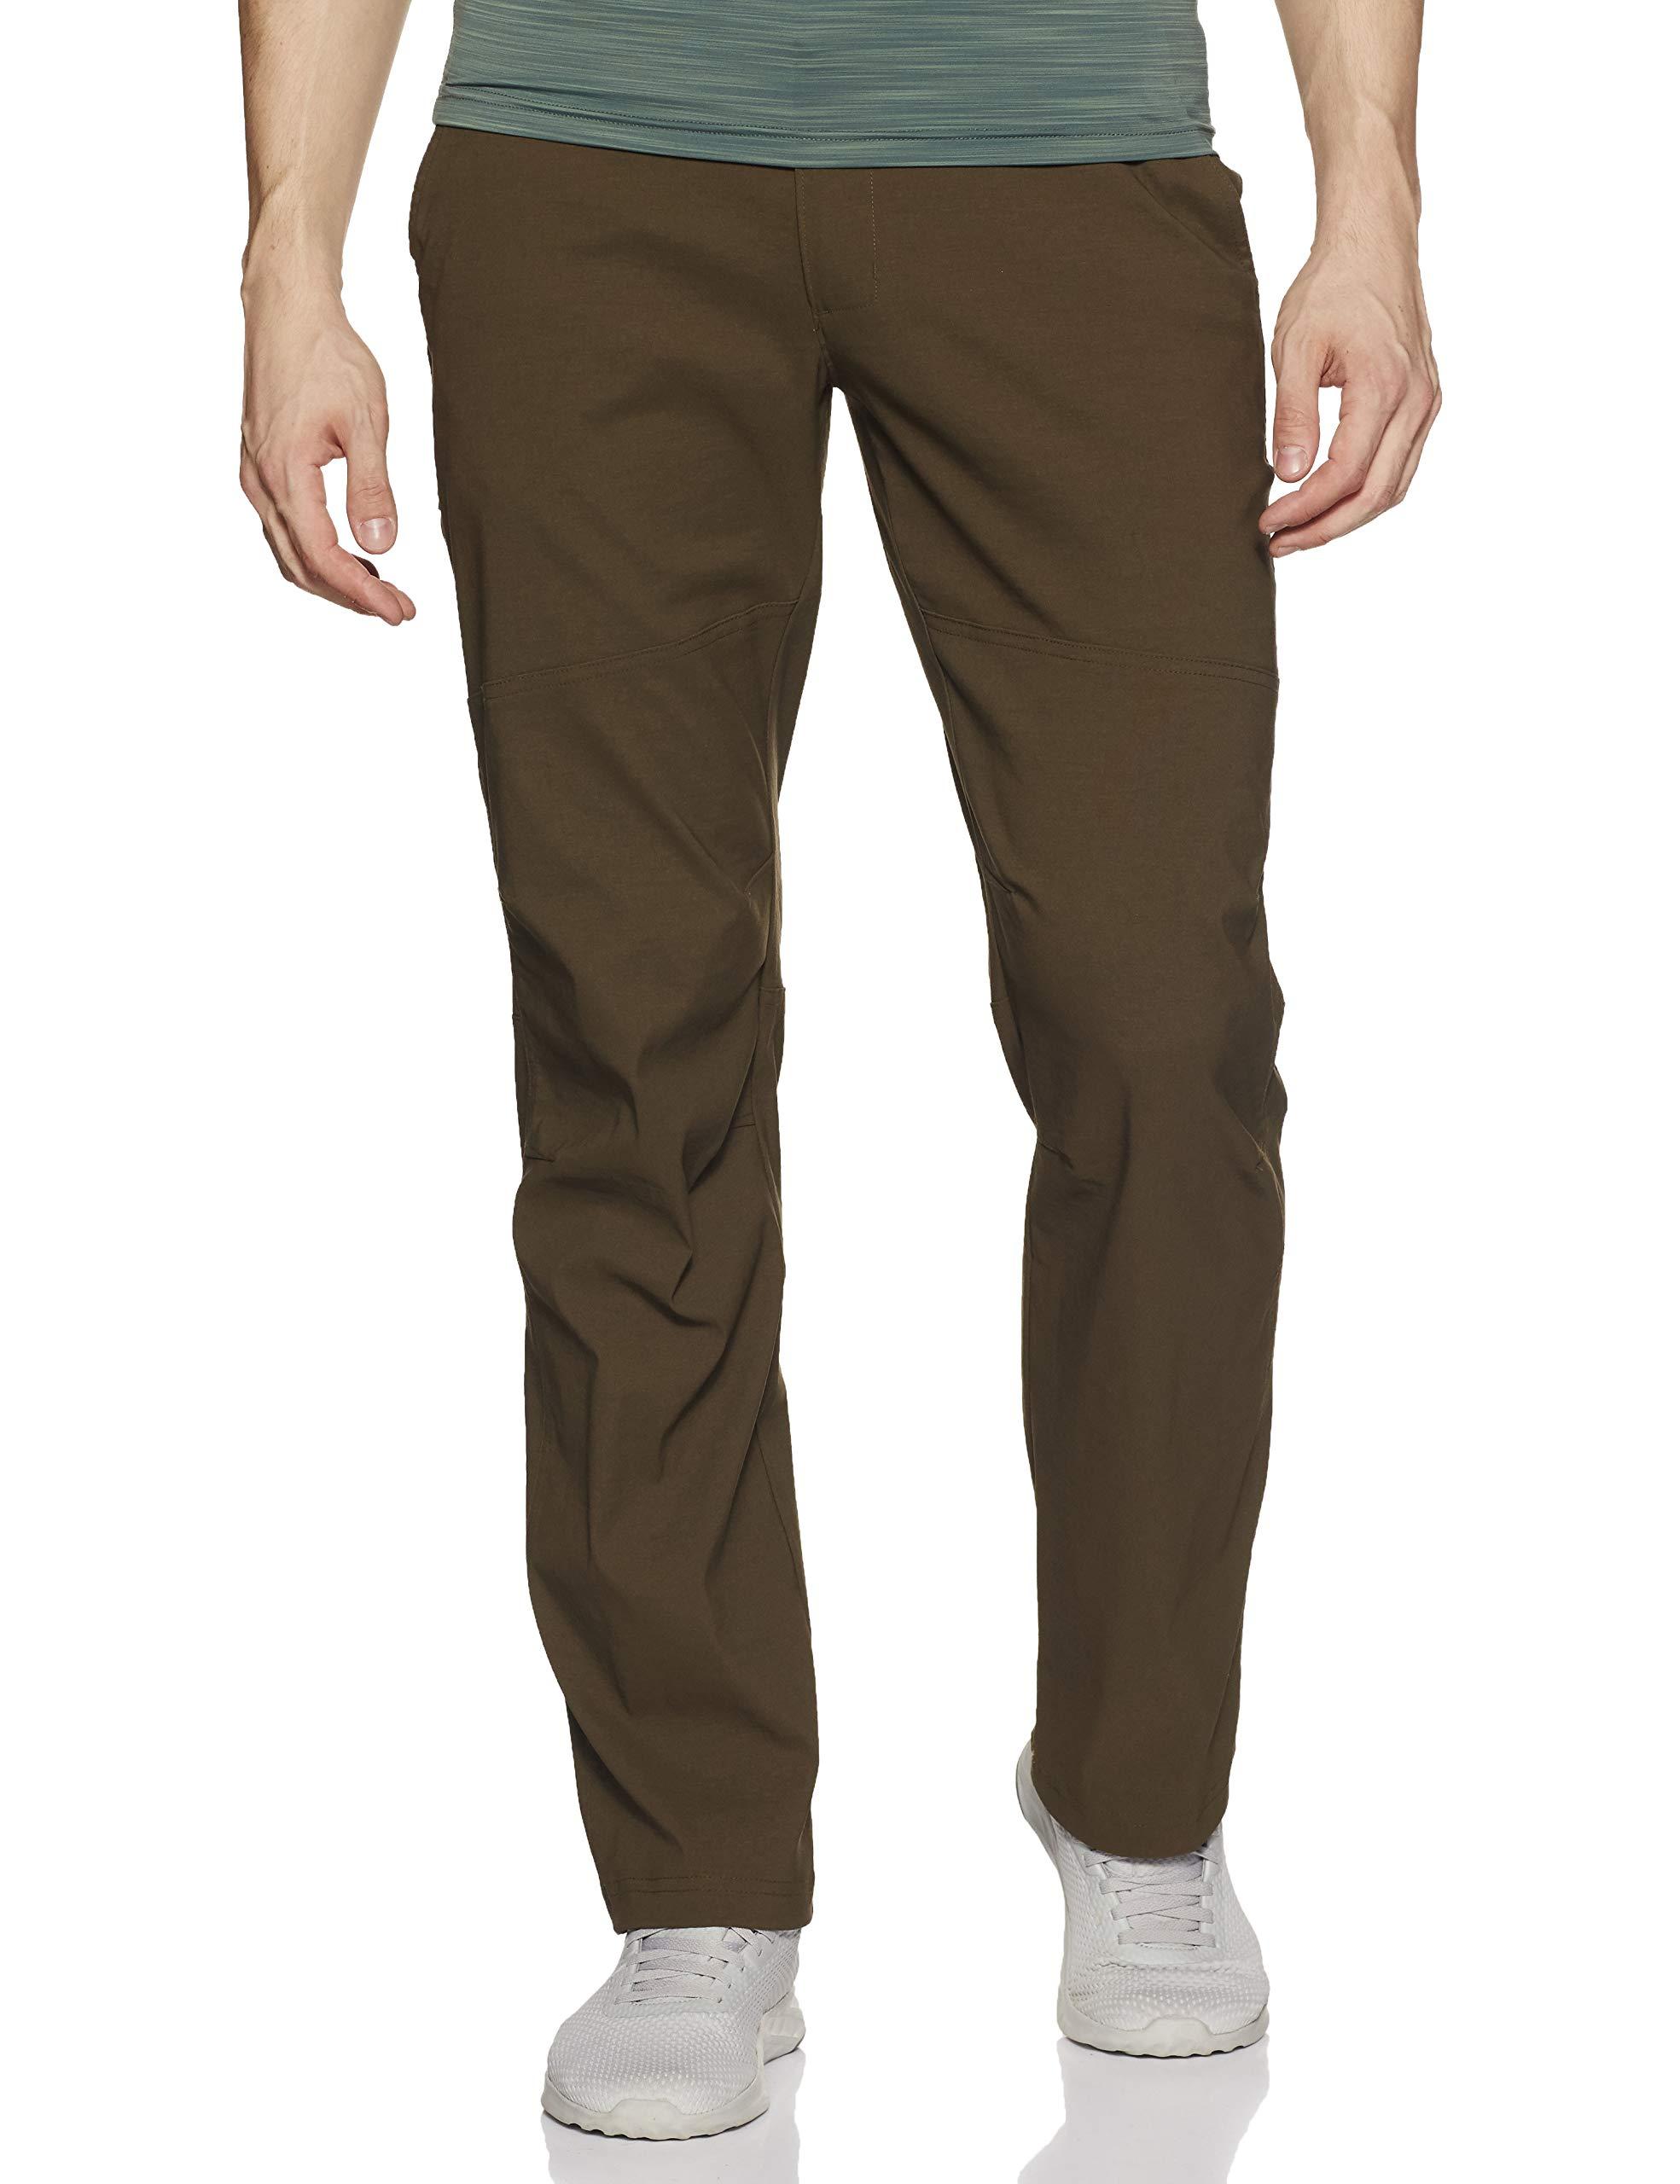 Columbia Men's Royce Peak II Hiking Pants, Water repellent, Stain Resistant, 42x32, Olive Green by Columbia